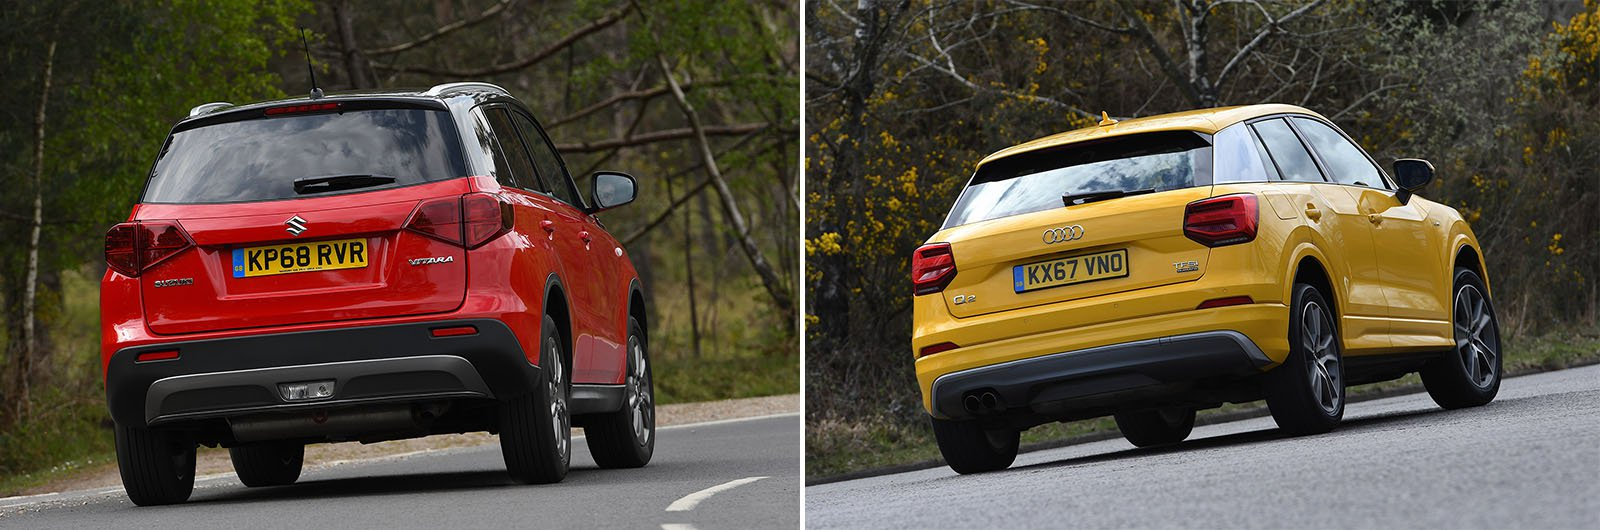 New Suzuki Vitara vs used Audi Q2: which is best?